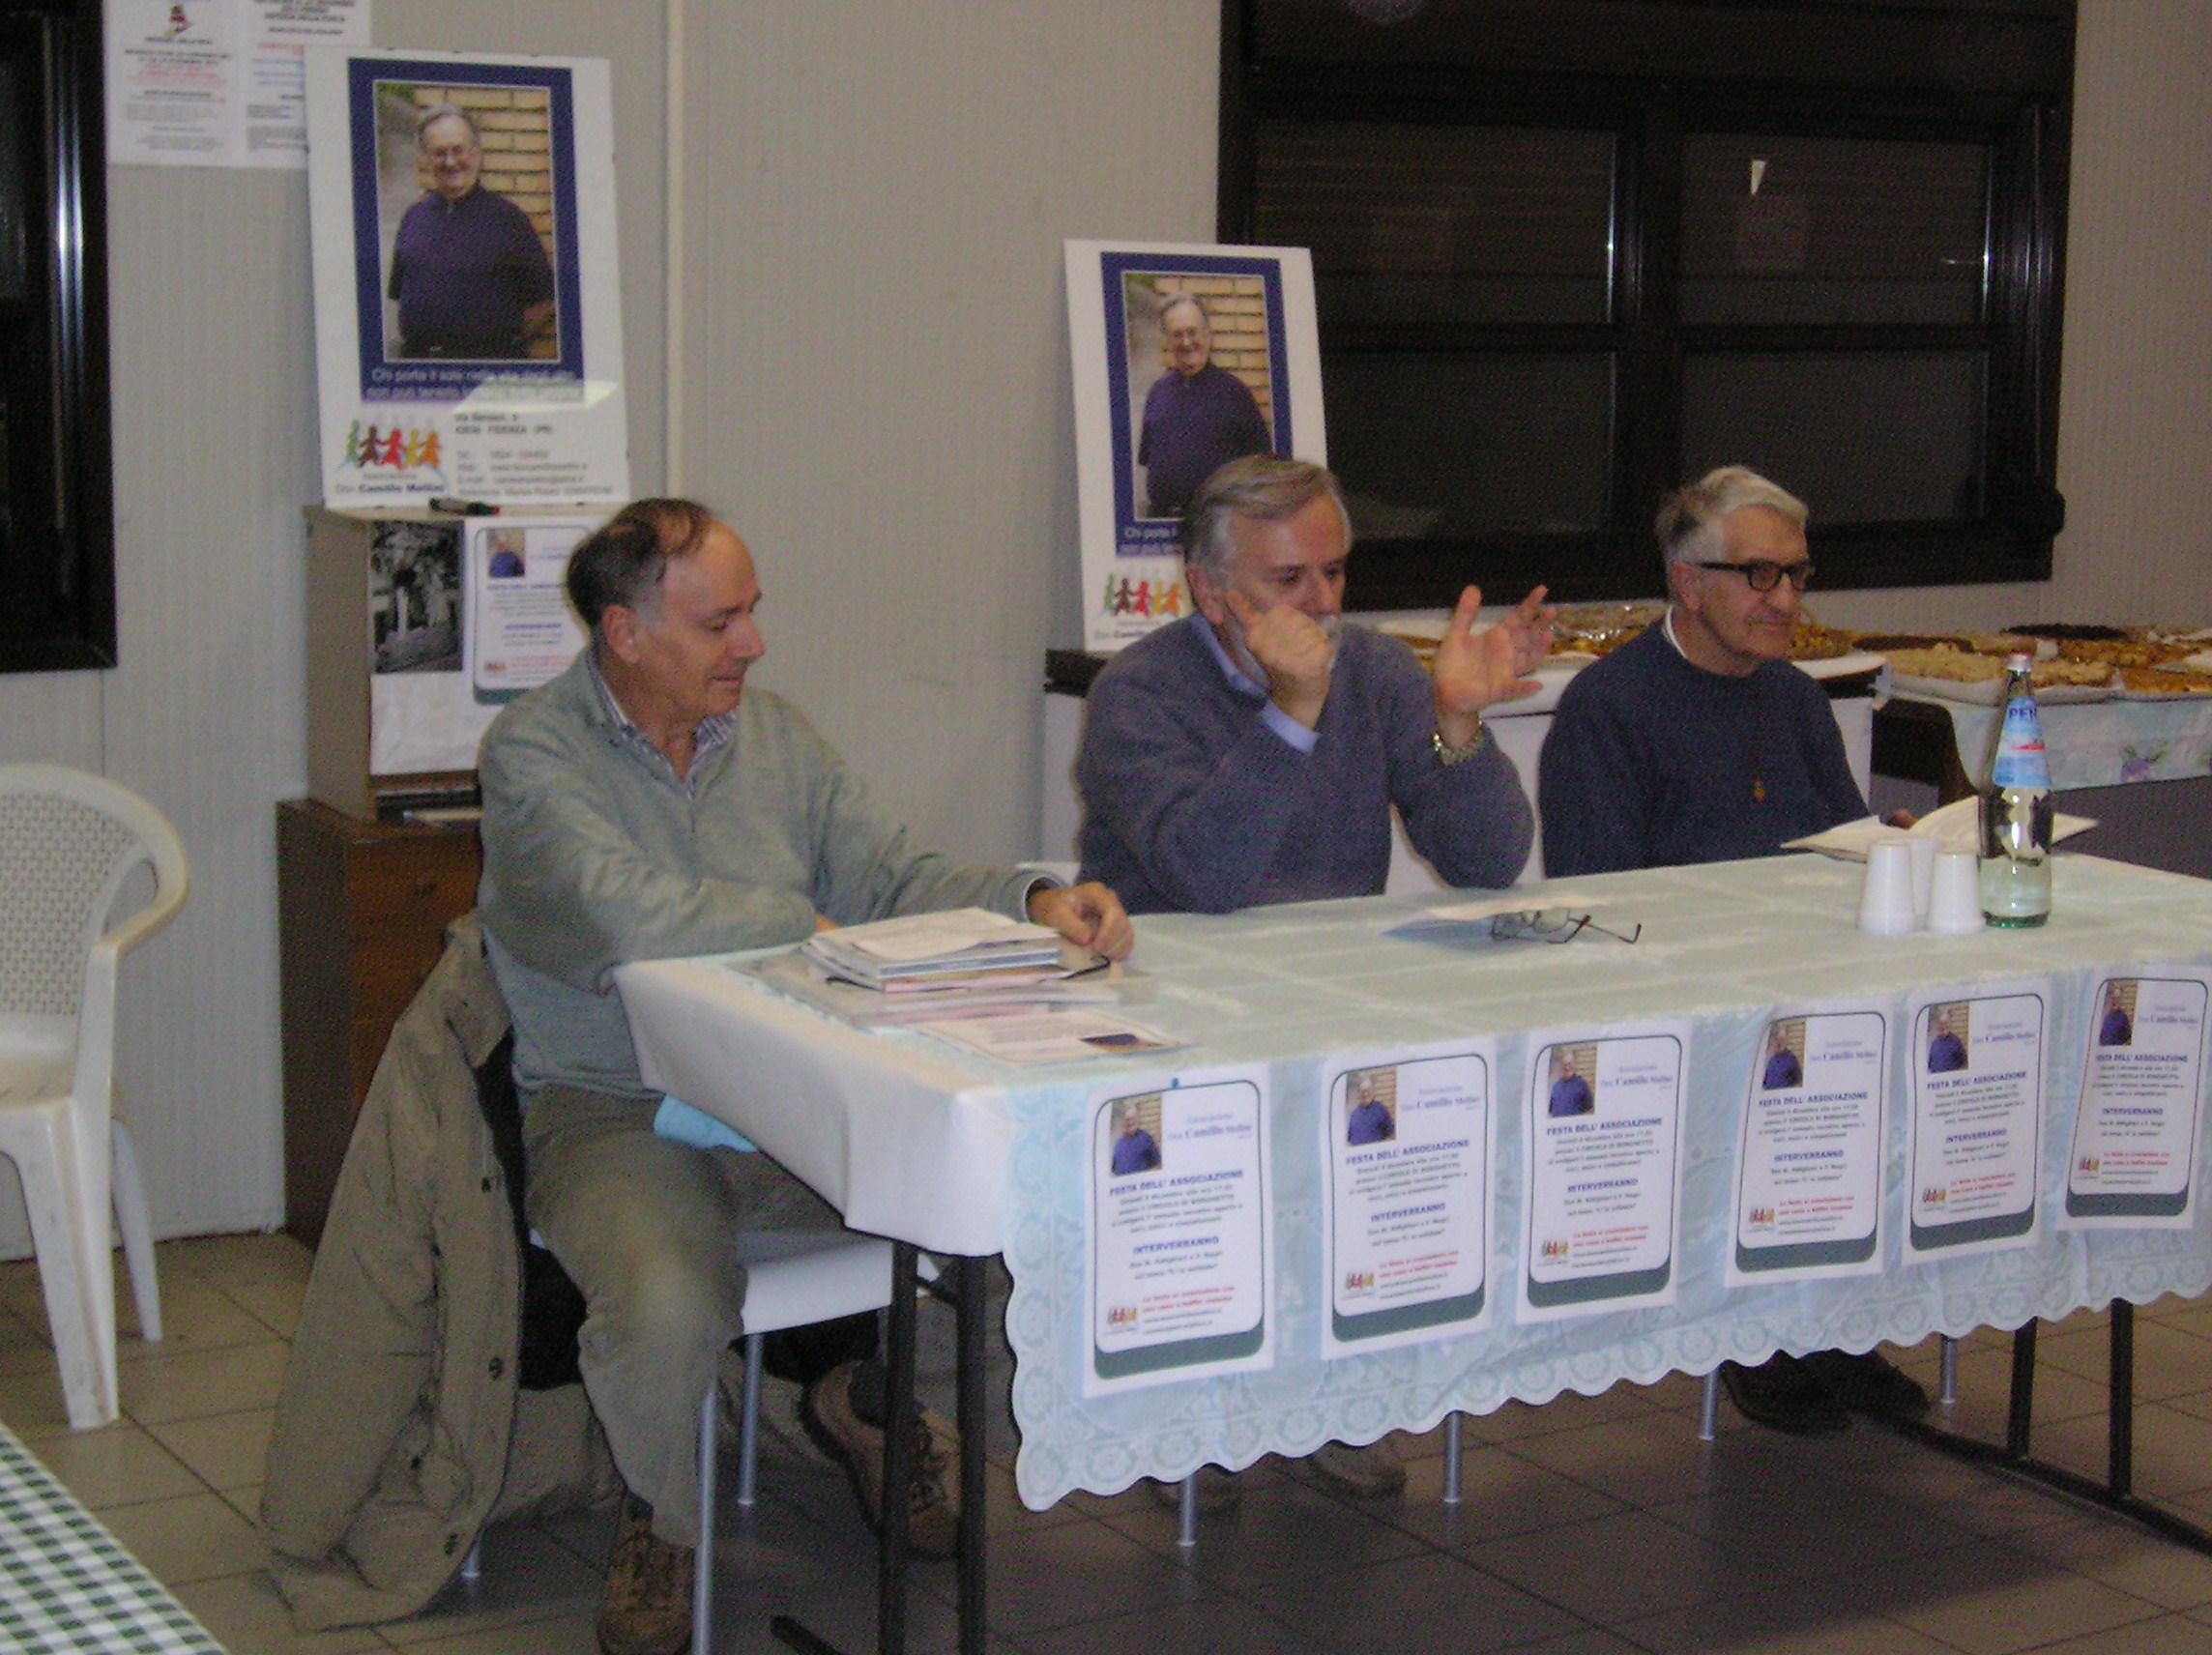 Rassegna stampa associazione don camillo mellini for Camera deputati rassegna stampa